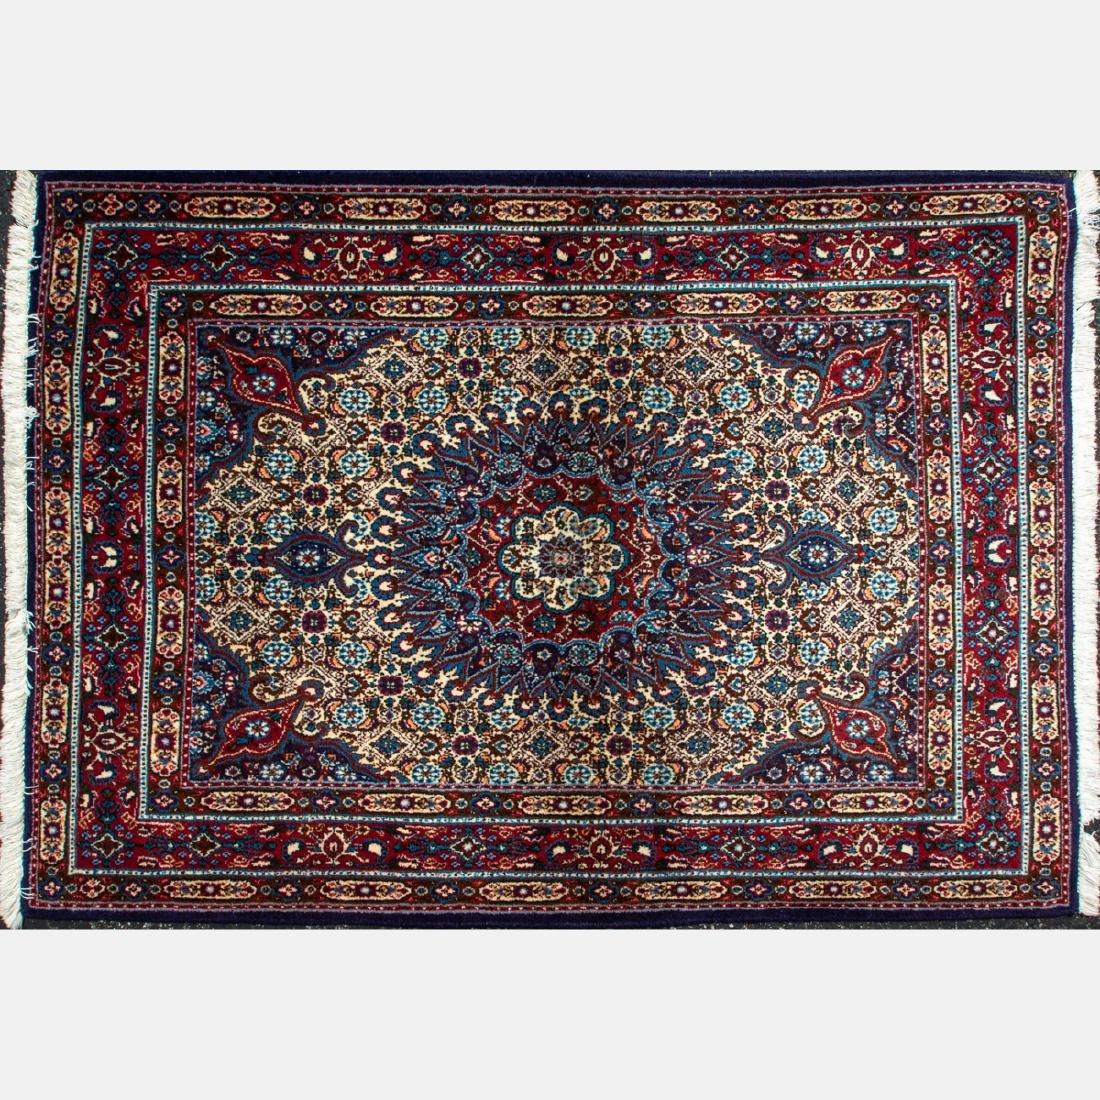 A Fine Persian Kashan Wool Rug, 20th Century.